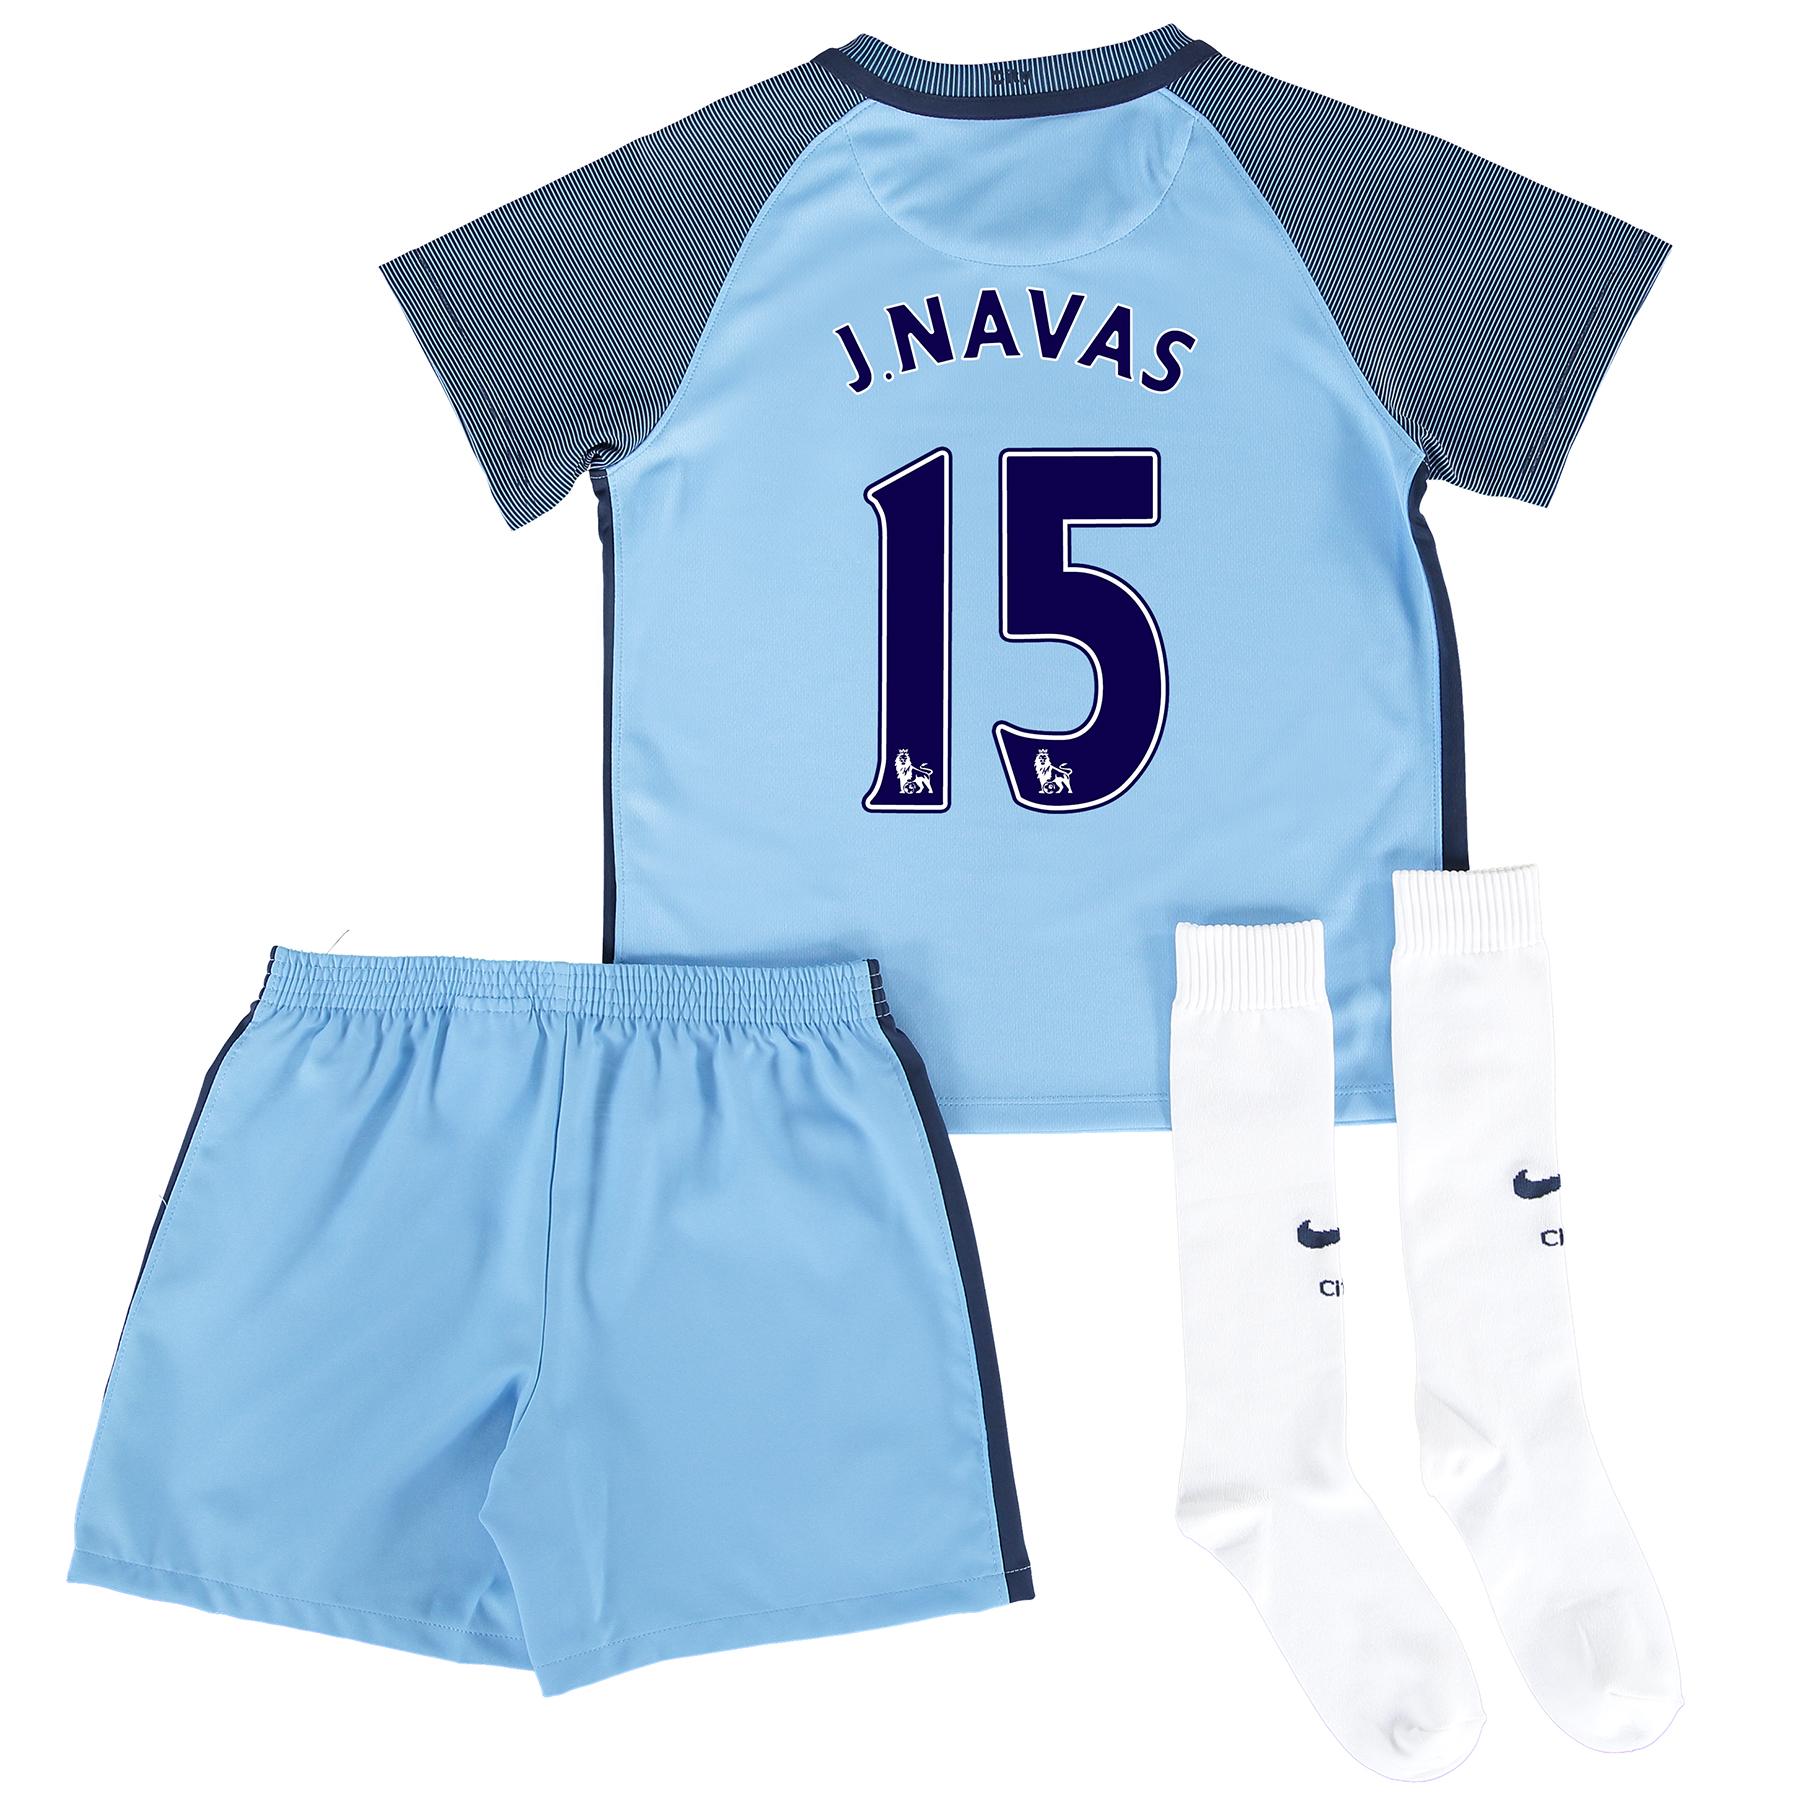 Manchester City Home Kit 2016-17 - Little Kids with J.Navas 15 printin